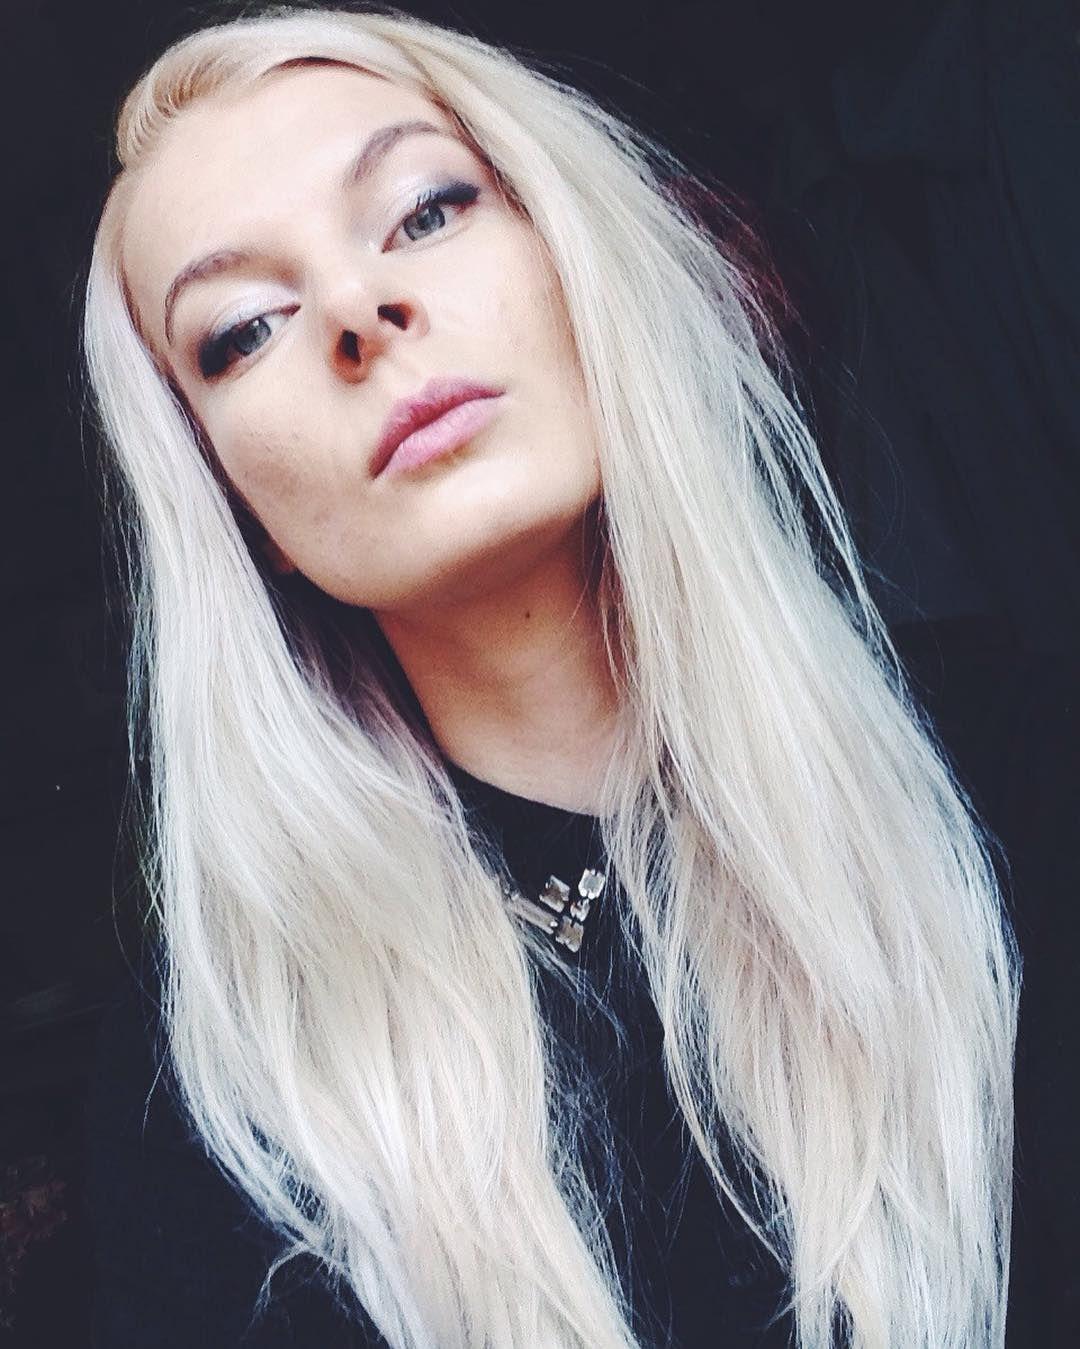 Feelin so bossy with my new hair blonde specialblonde